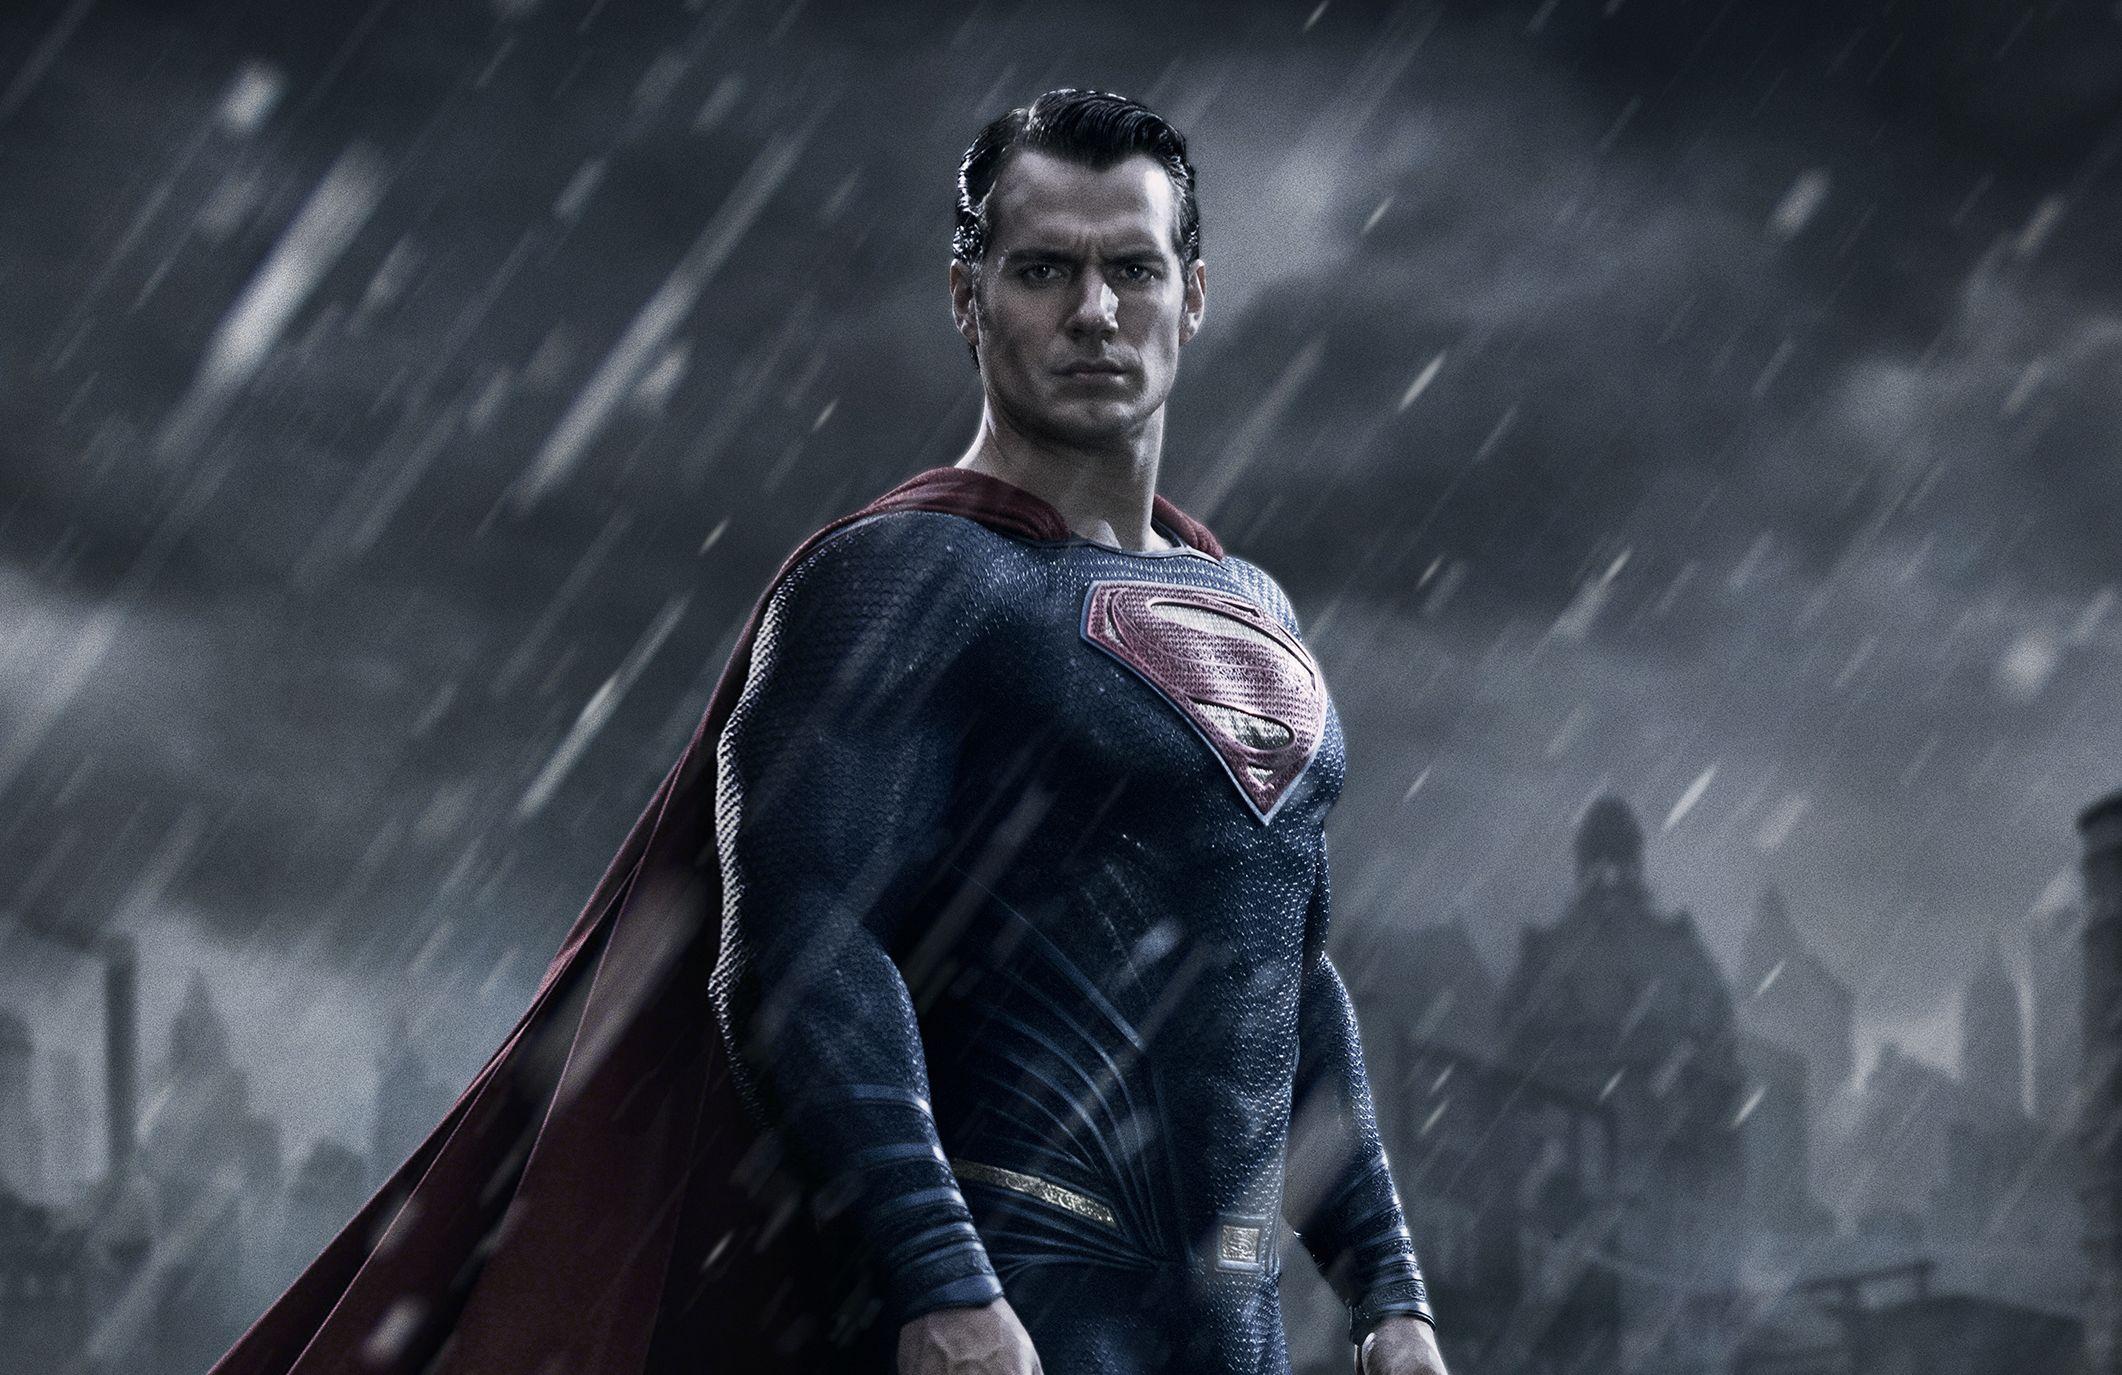 Henry-Cavill-Superman-BvS-HQ-P